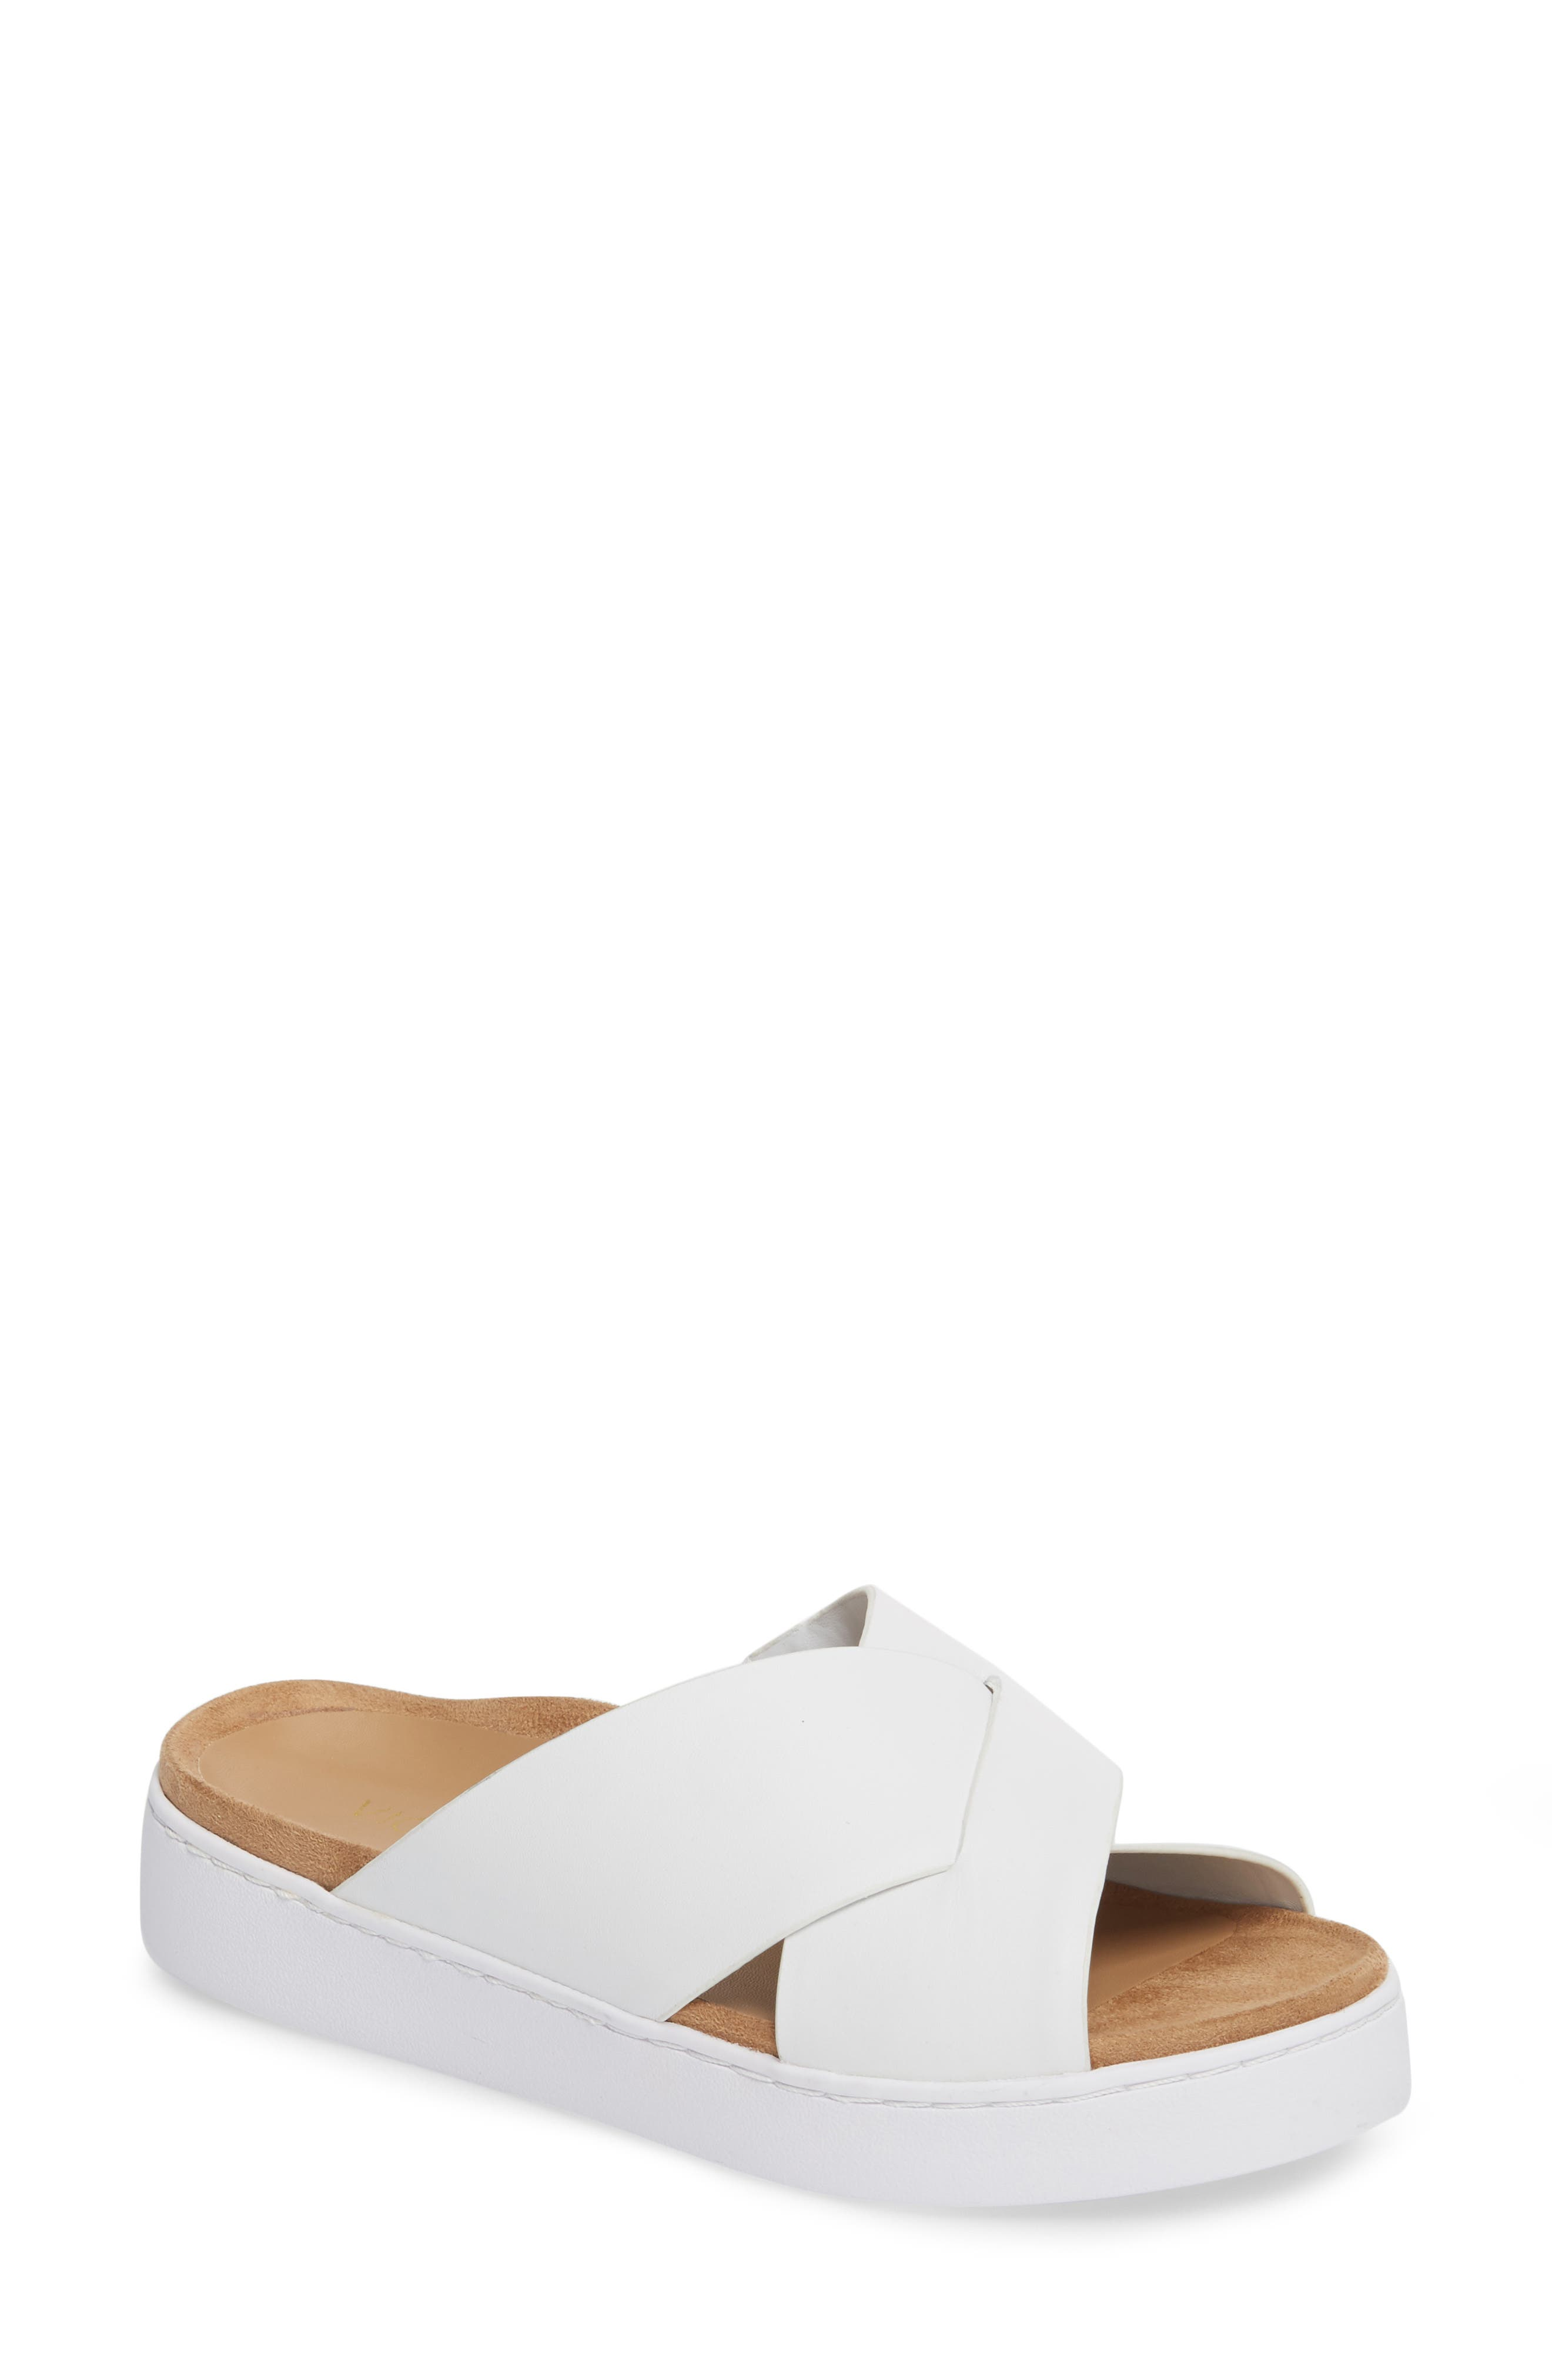 Lou Slide Sandal,                             Main thumbnail 1, color,                             White Leather